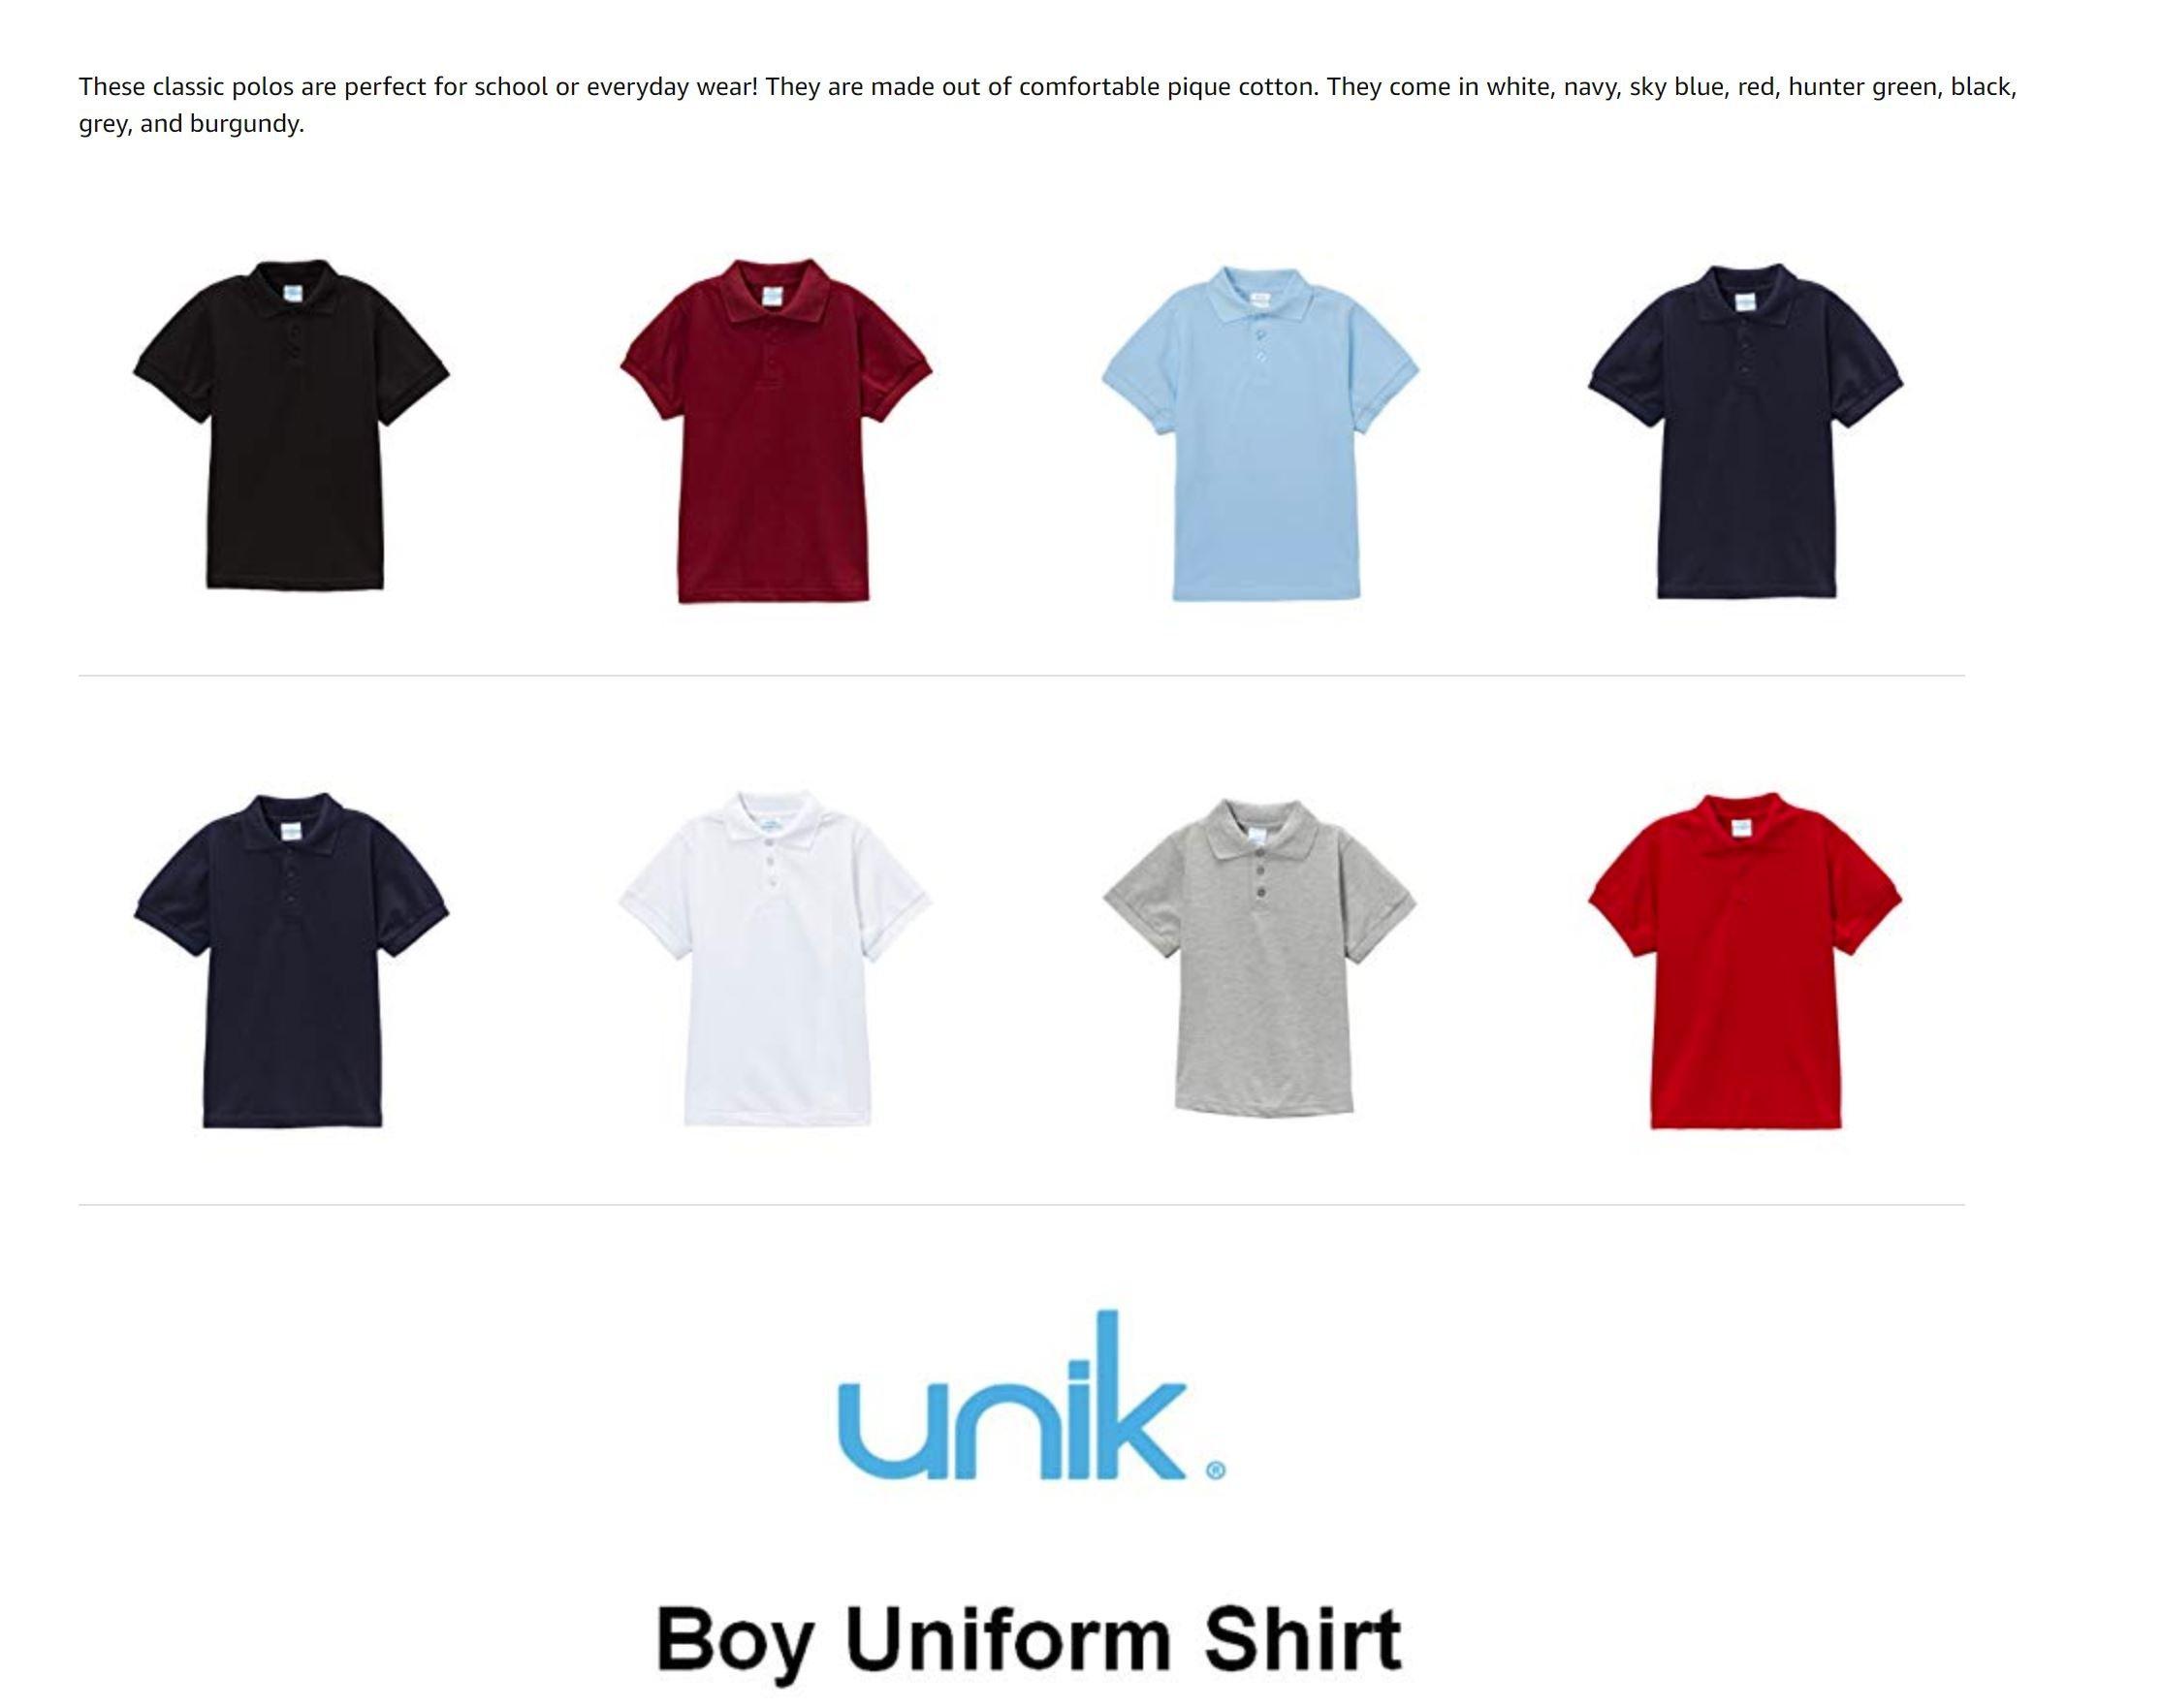 unik Boys Premium Fleece Sweatpants Size 5-16 Super Warm and Comfortable Great for PE Class